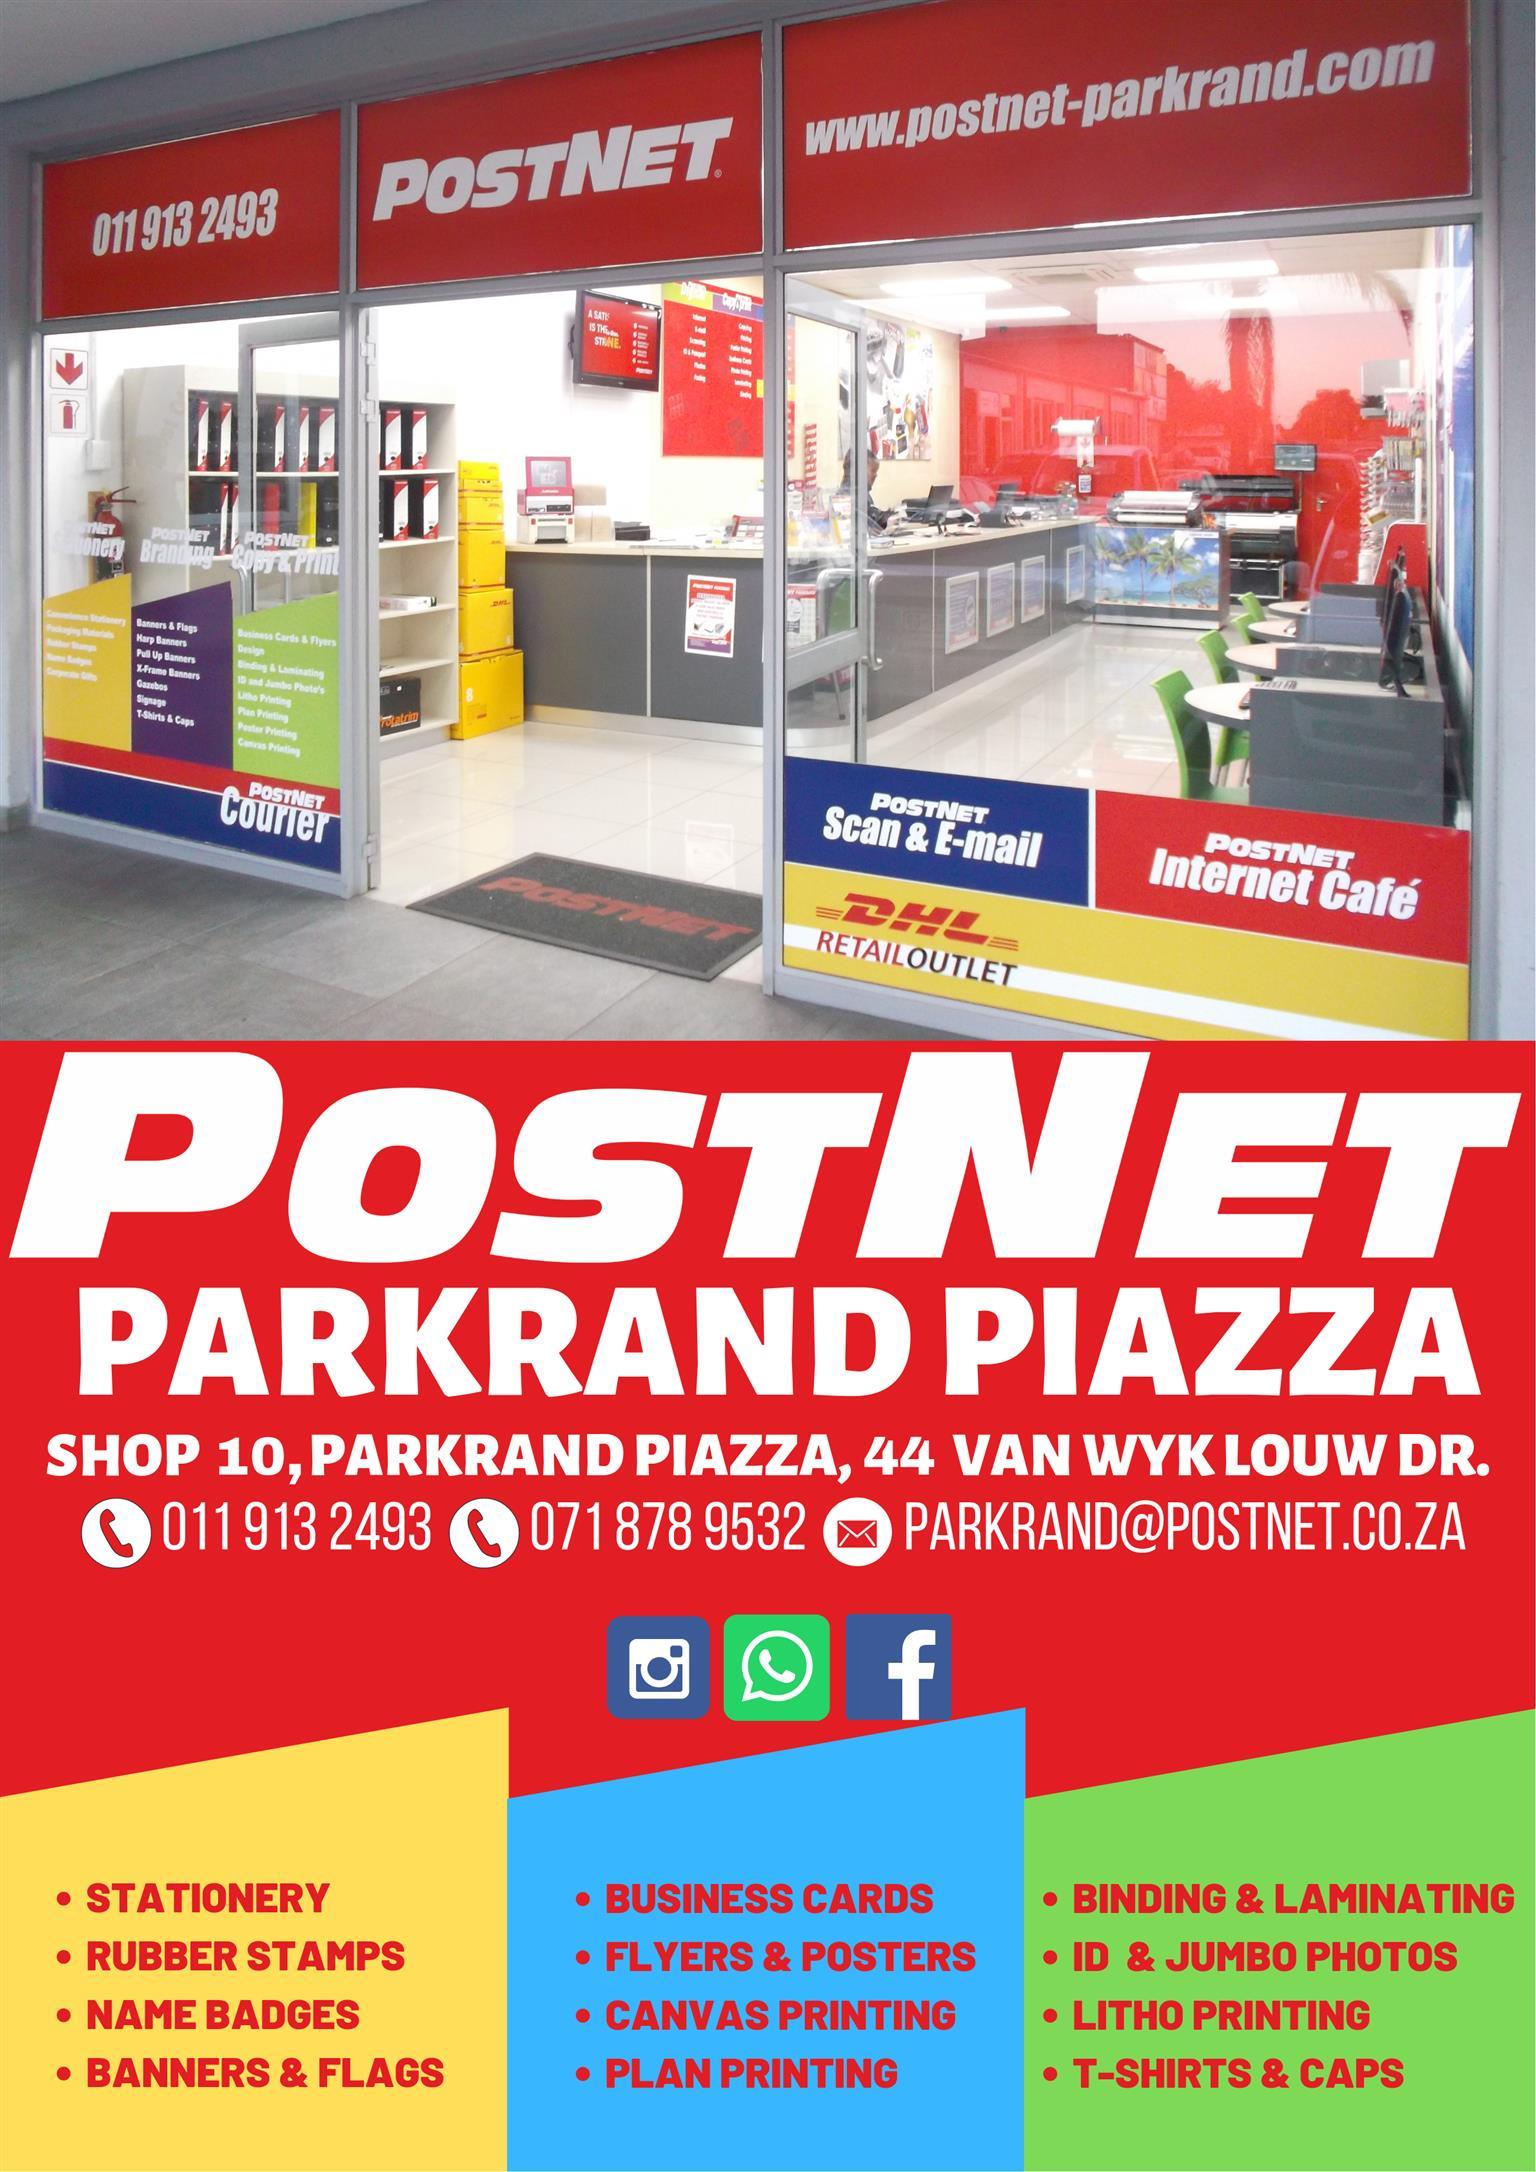 Postnet Parkrand, why go anywhere else